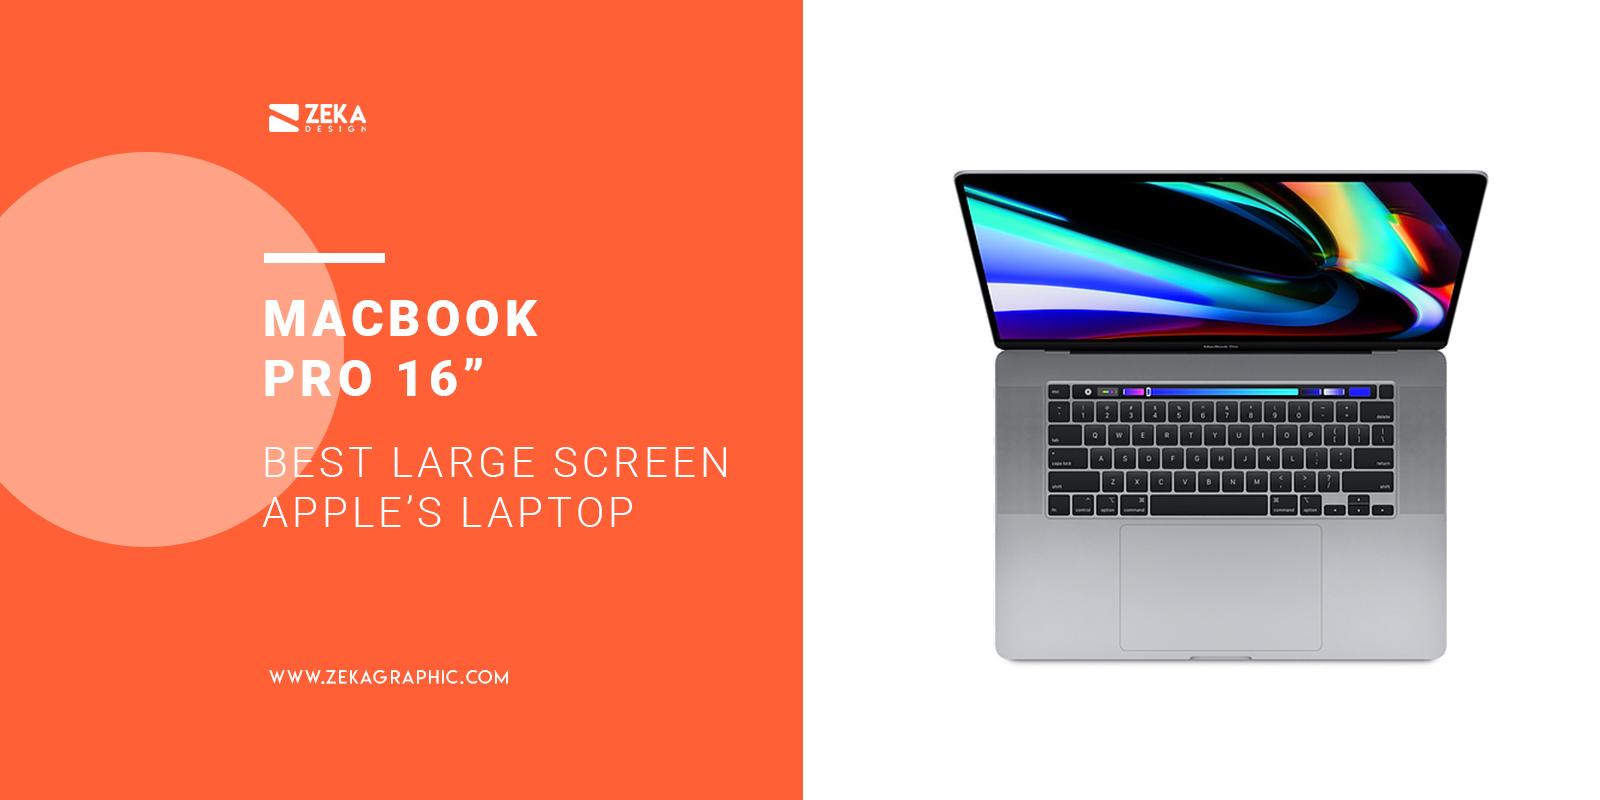 Apple MacBook Pro 16 Best Large Screen Laptop